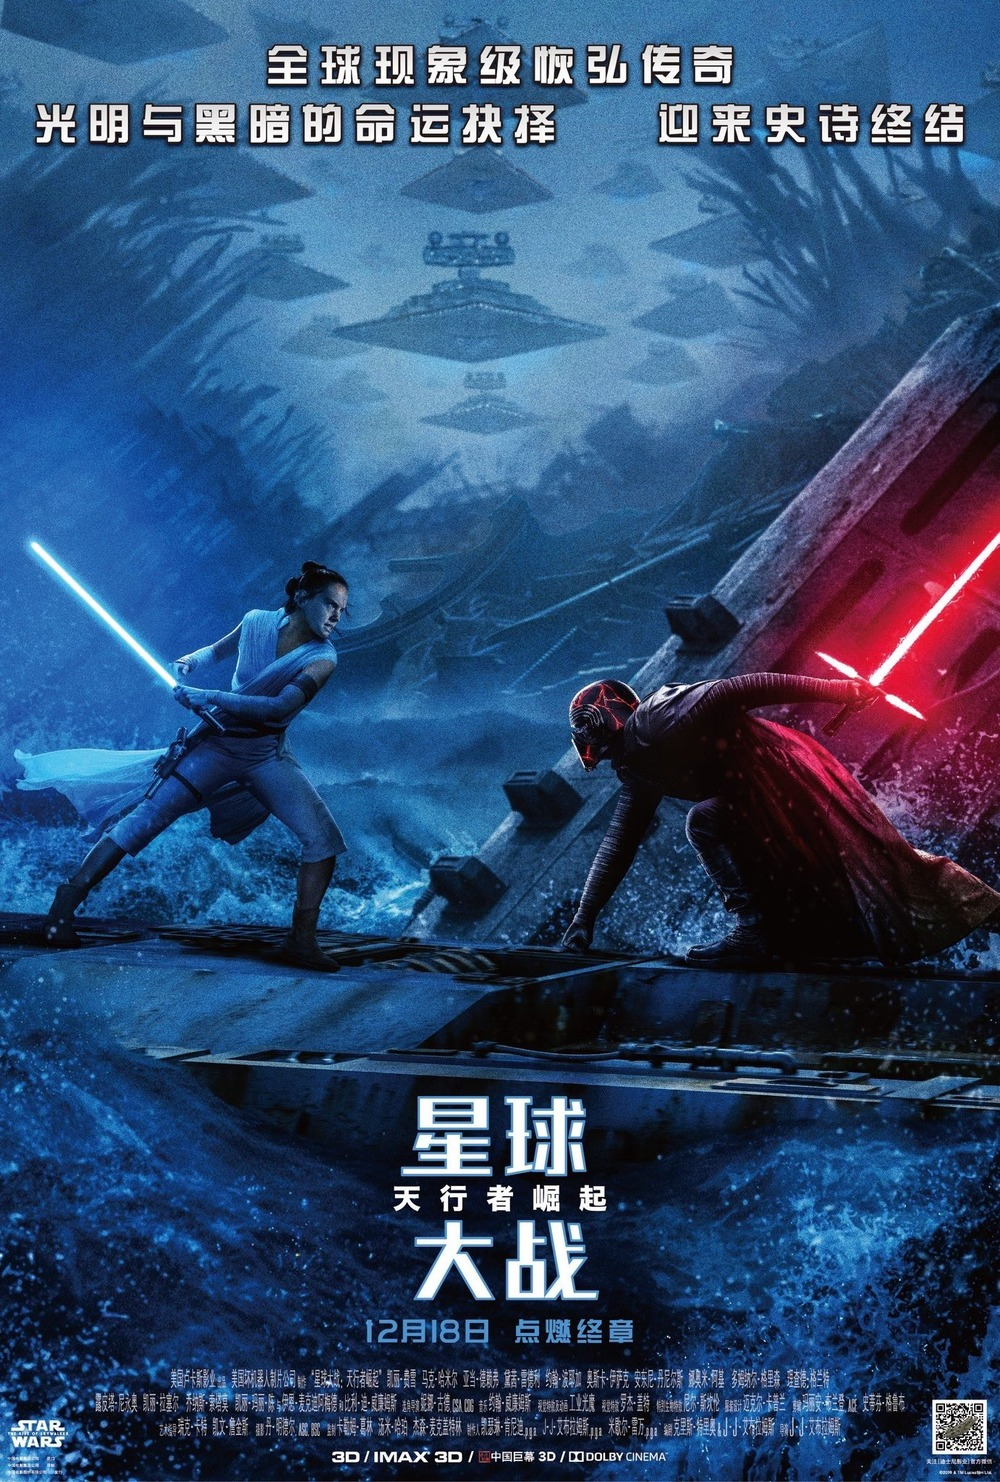 Star Wars The Rise Of Skywalker Dvd Release Date Redbox Netflix Itunes Amazon